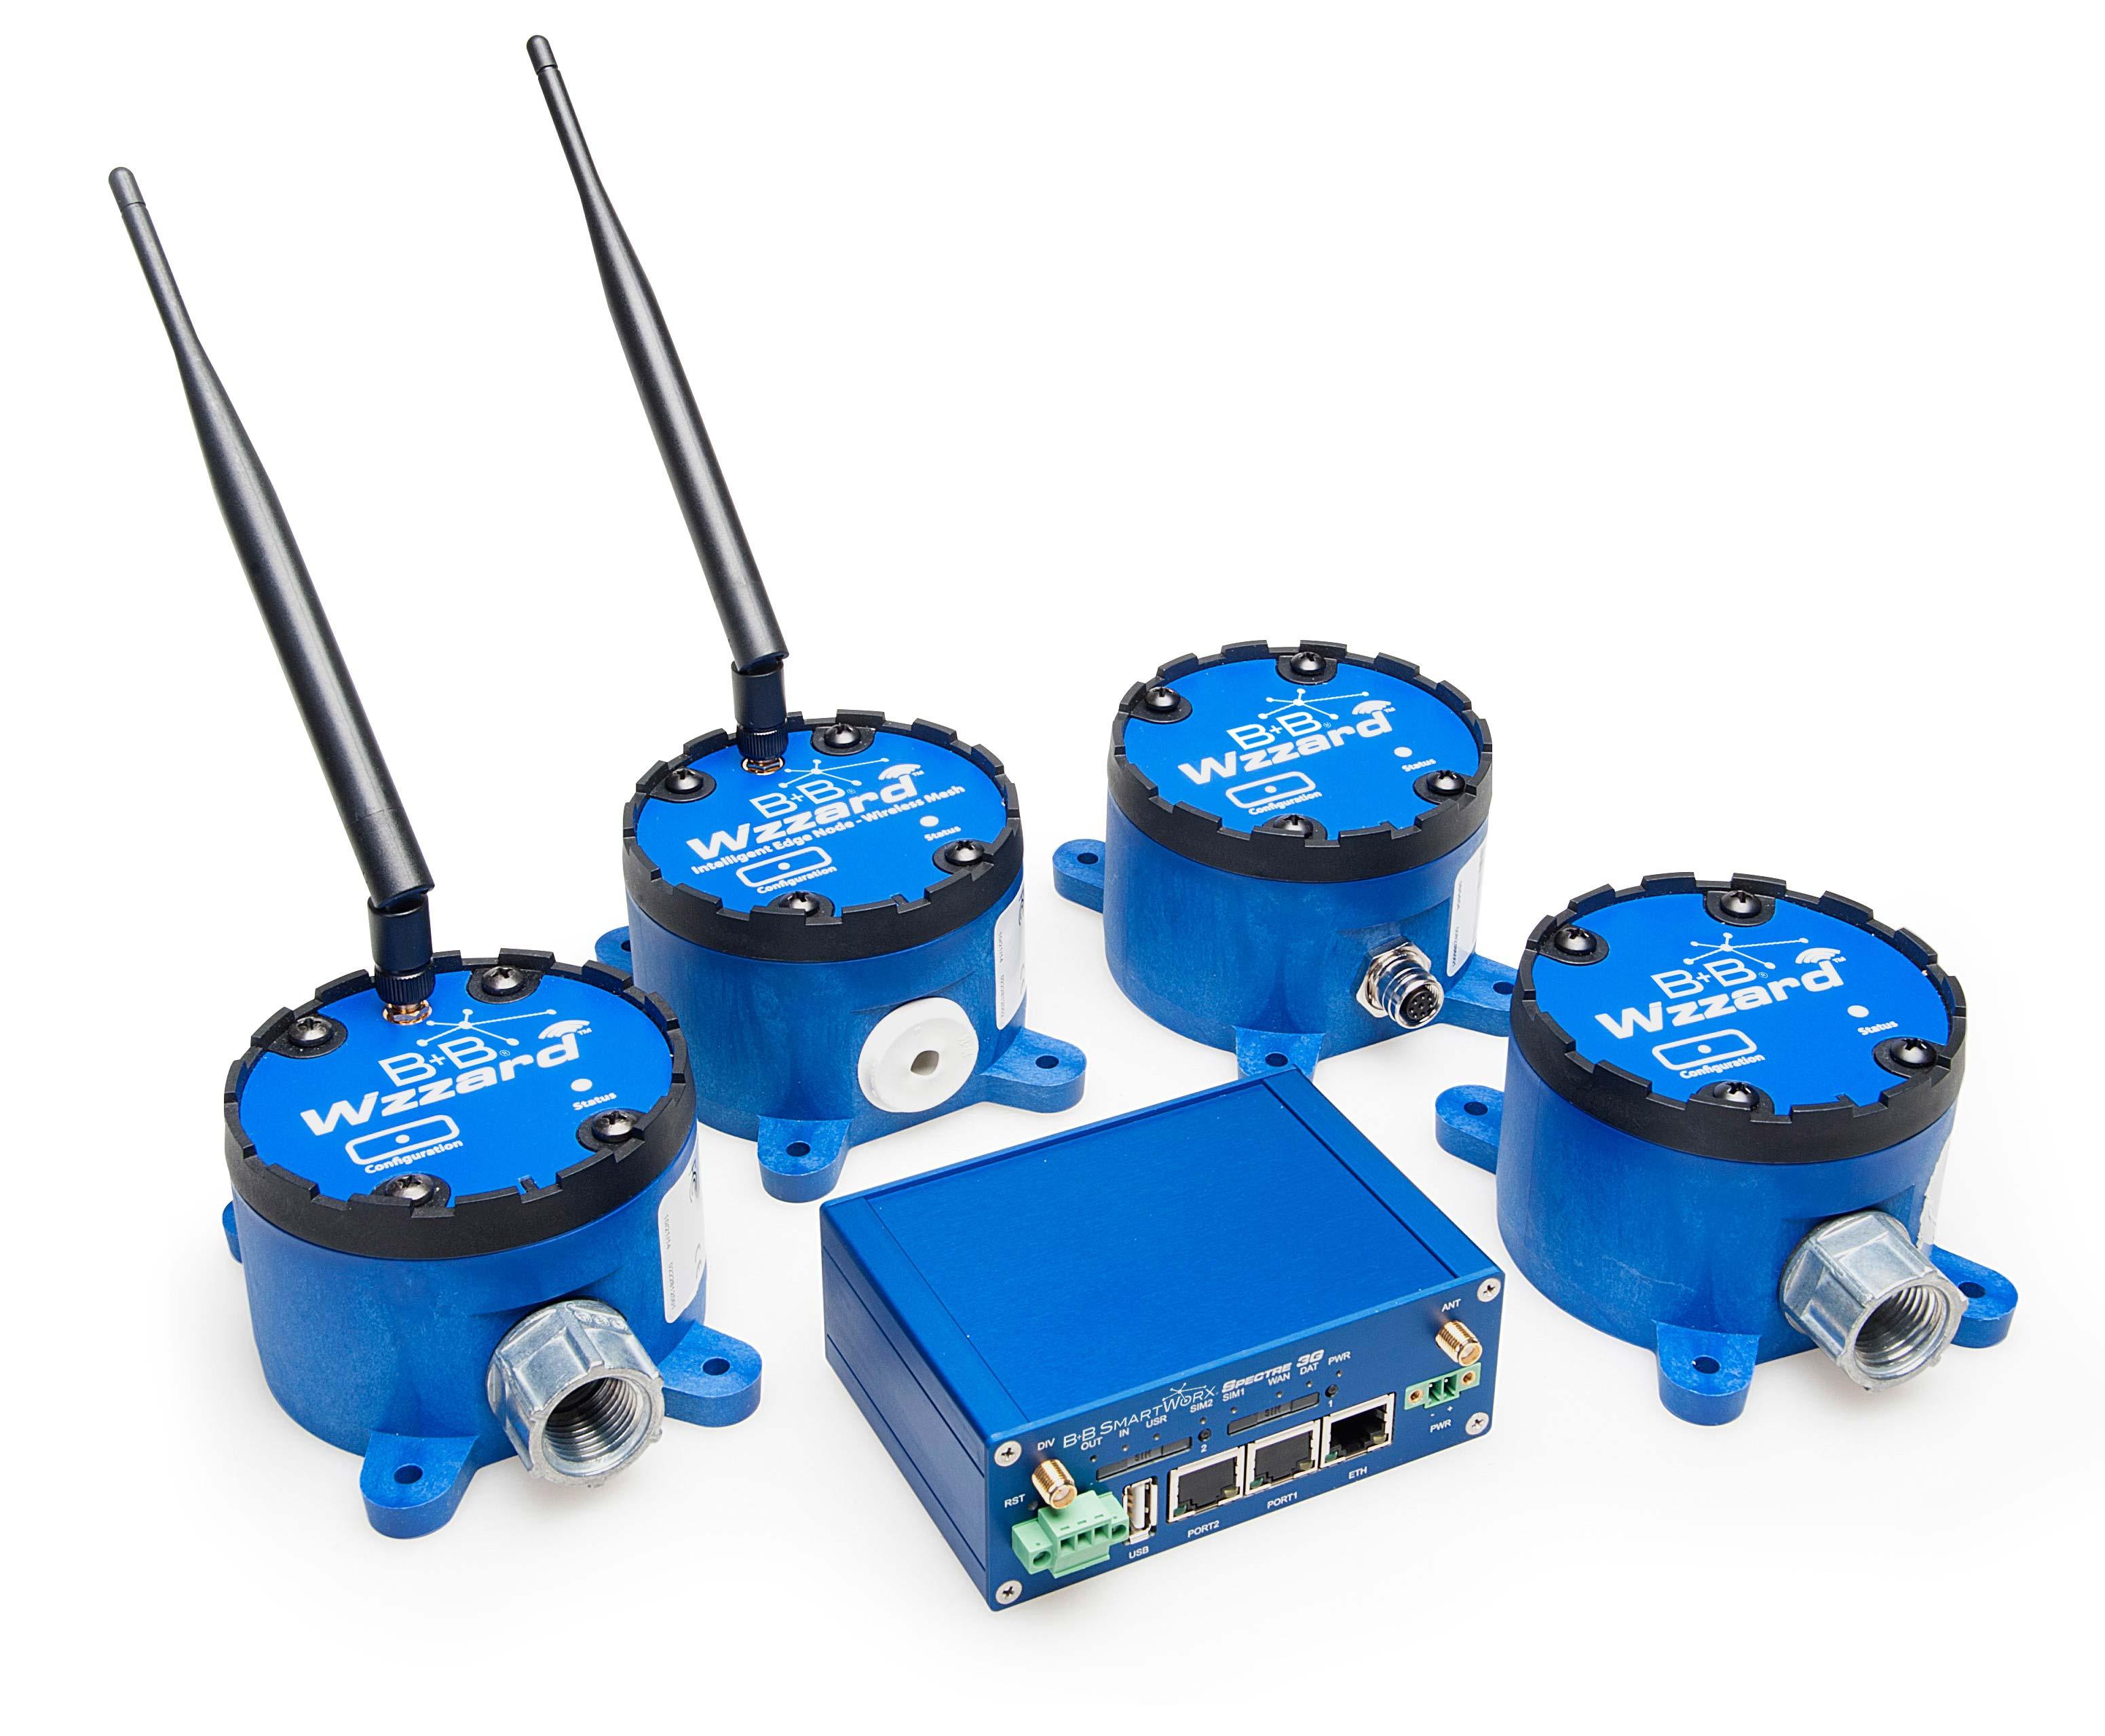 Airborne Wireless Network >> B&B Bringing Legacy Systems into Industrial IoT - B+B SmartWorx